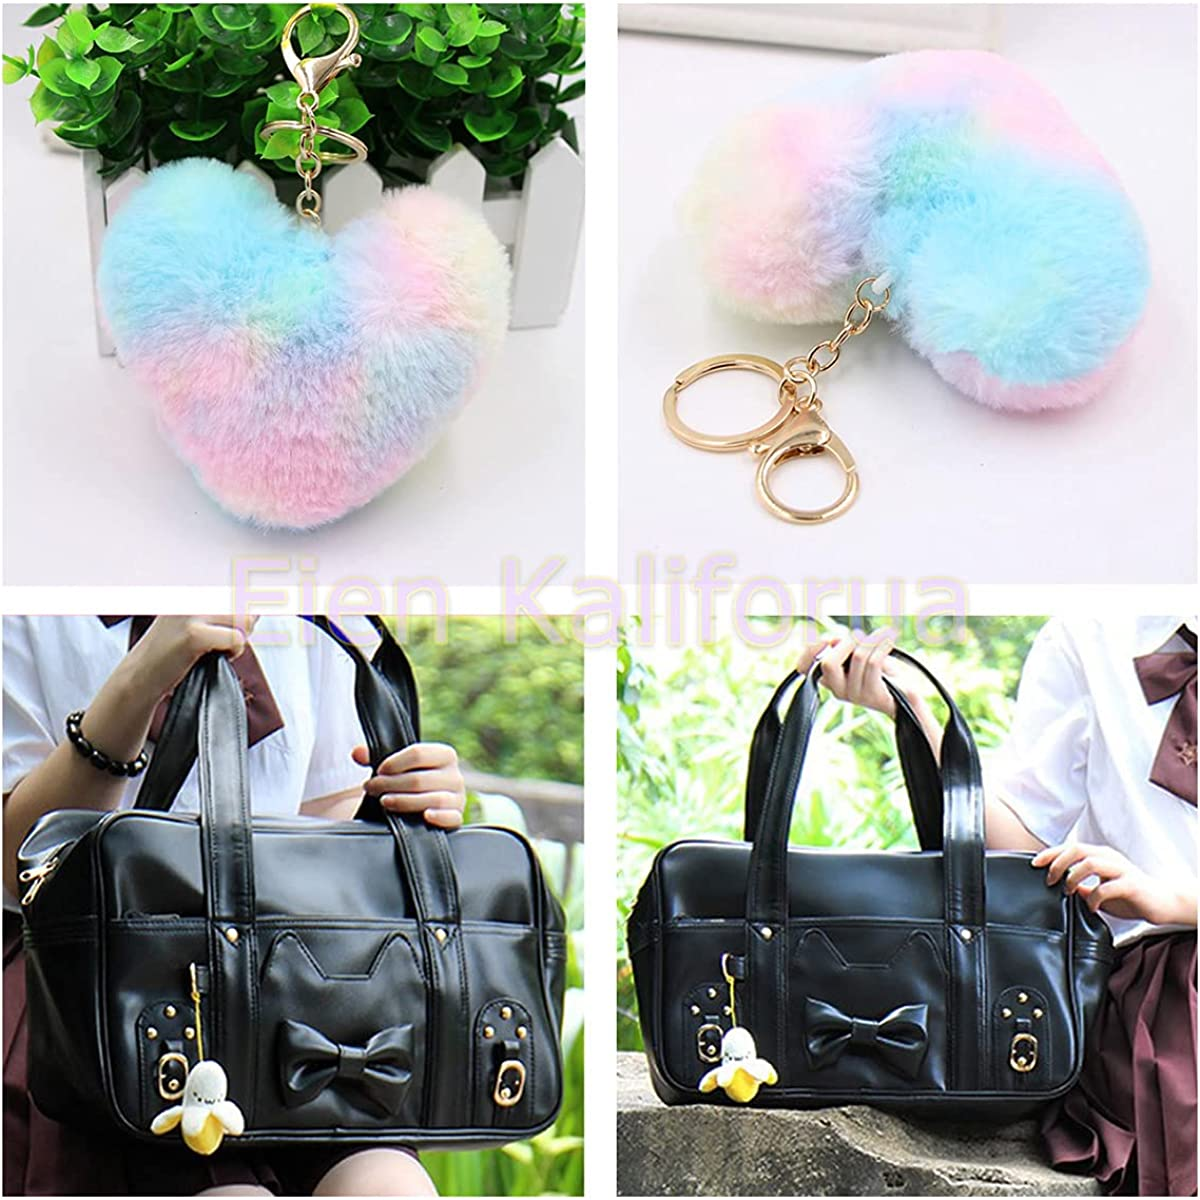 Eien Kaliforua Japanese JK Uniform Shoulder Bag PU Faux School Bag Kawaii Lolita Handbag